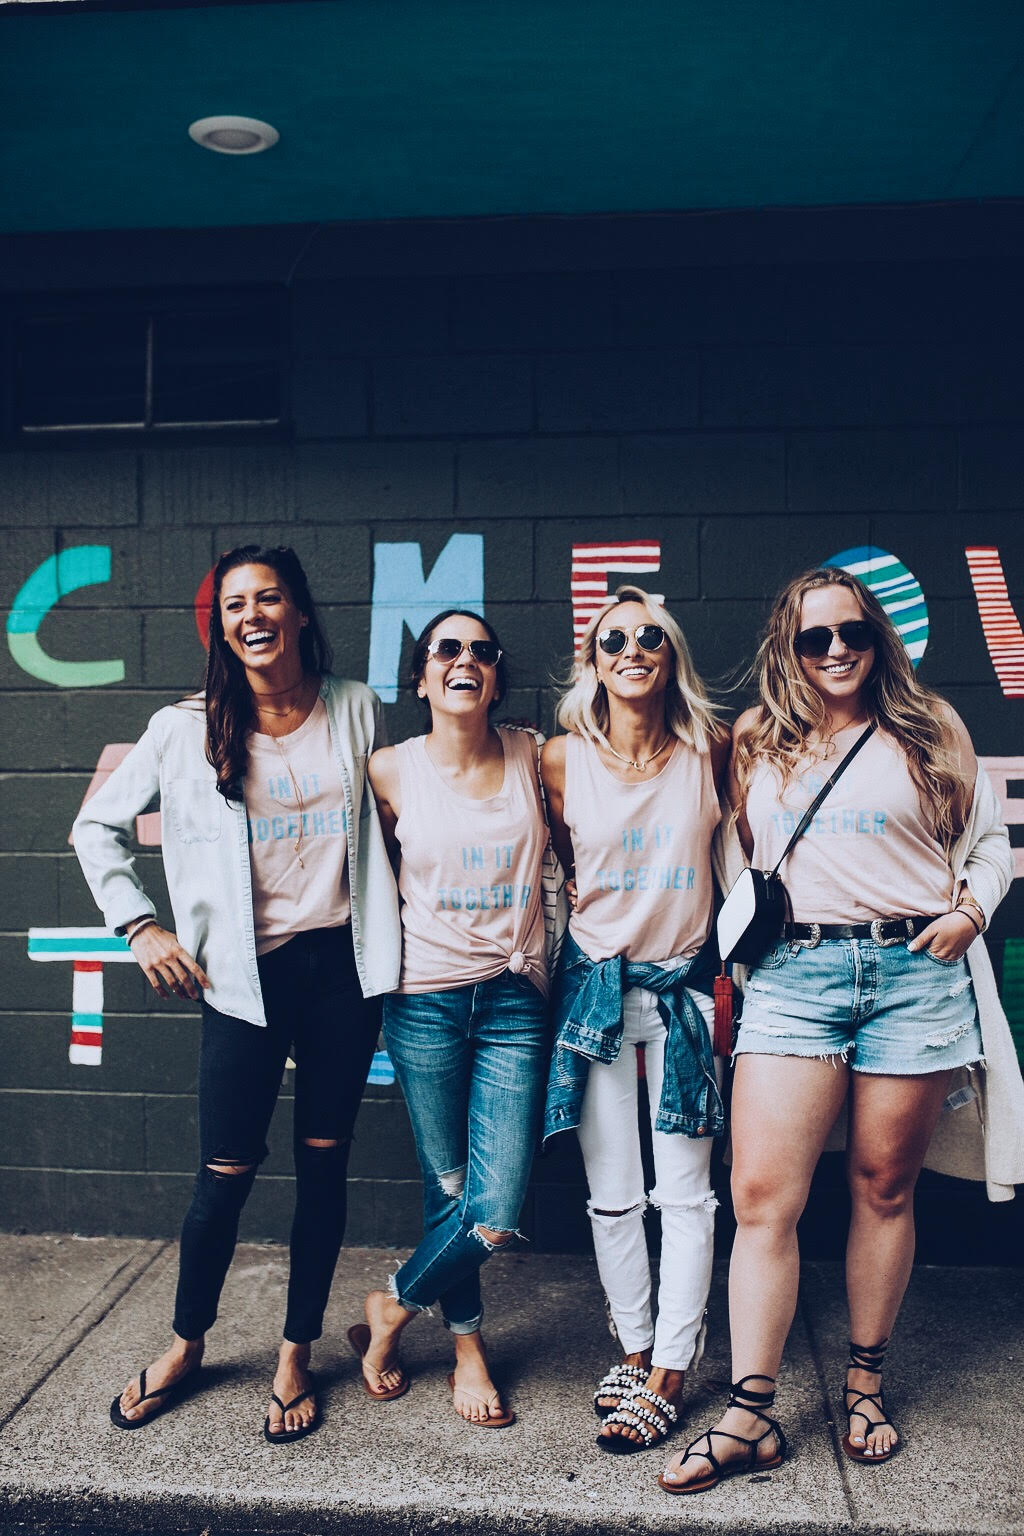 Photo: Julianna Arendash Photography- Location: Masons Creamery- Wall Art: Erin Guido  Models (left to right)- Ally Grubba, Brittany Whittman, Lauren Letizio, Alexandra Rose